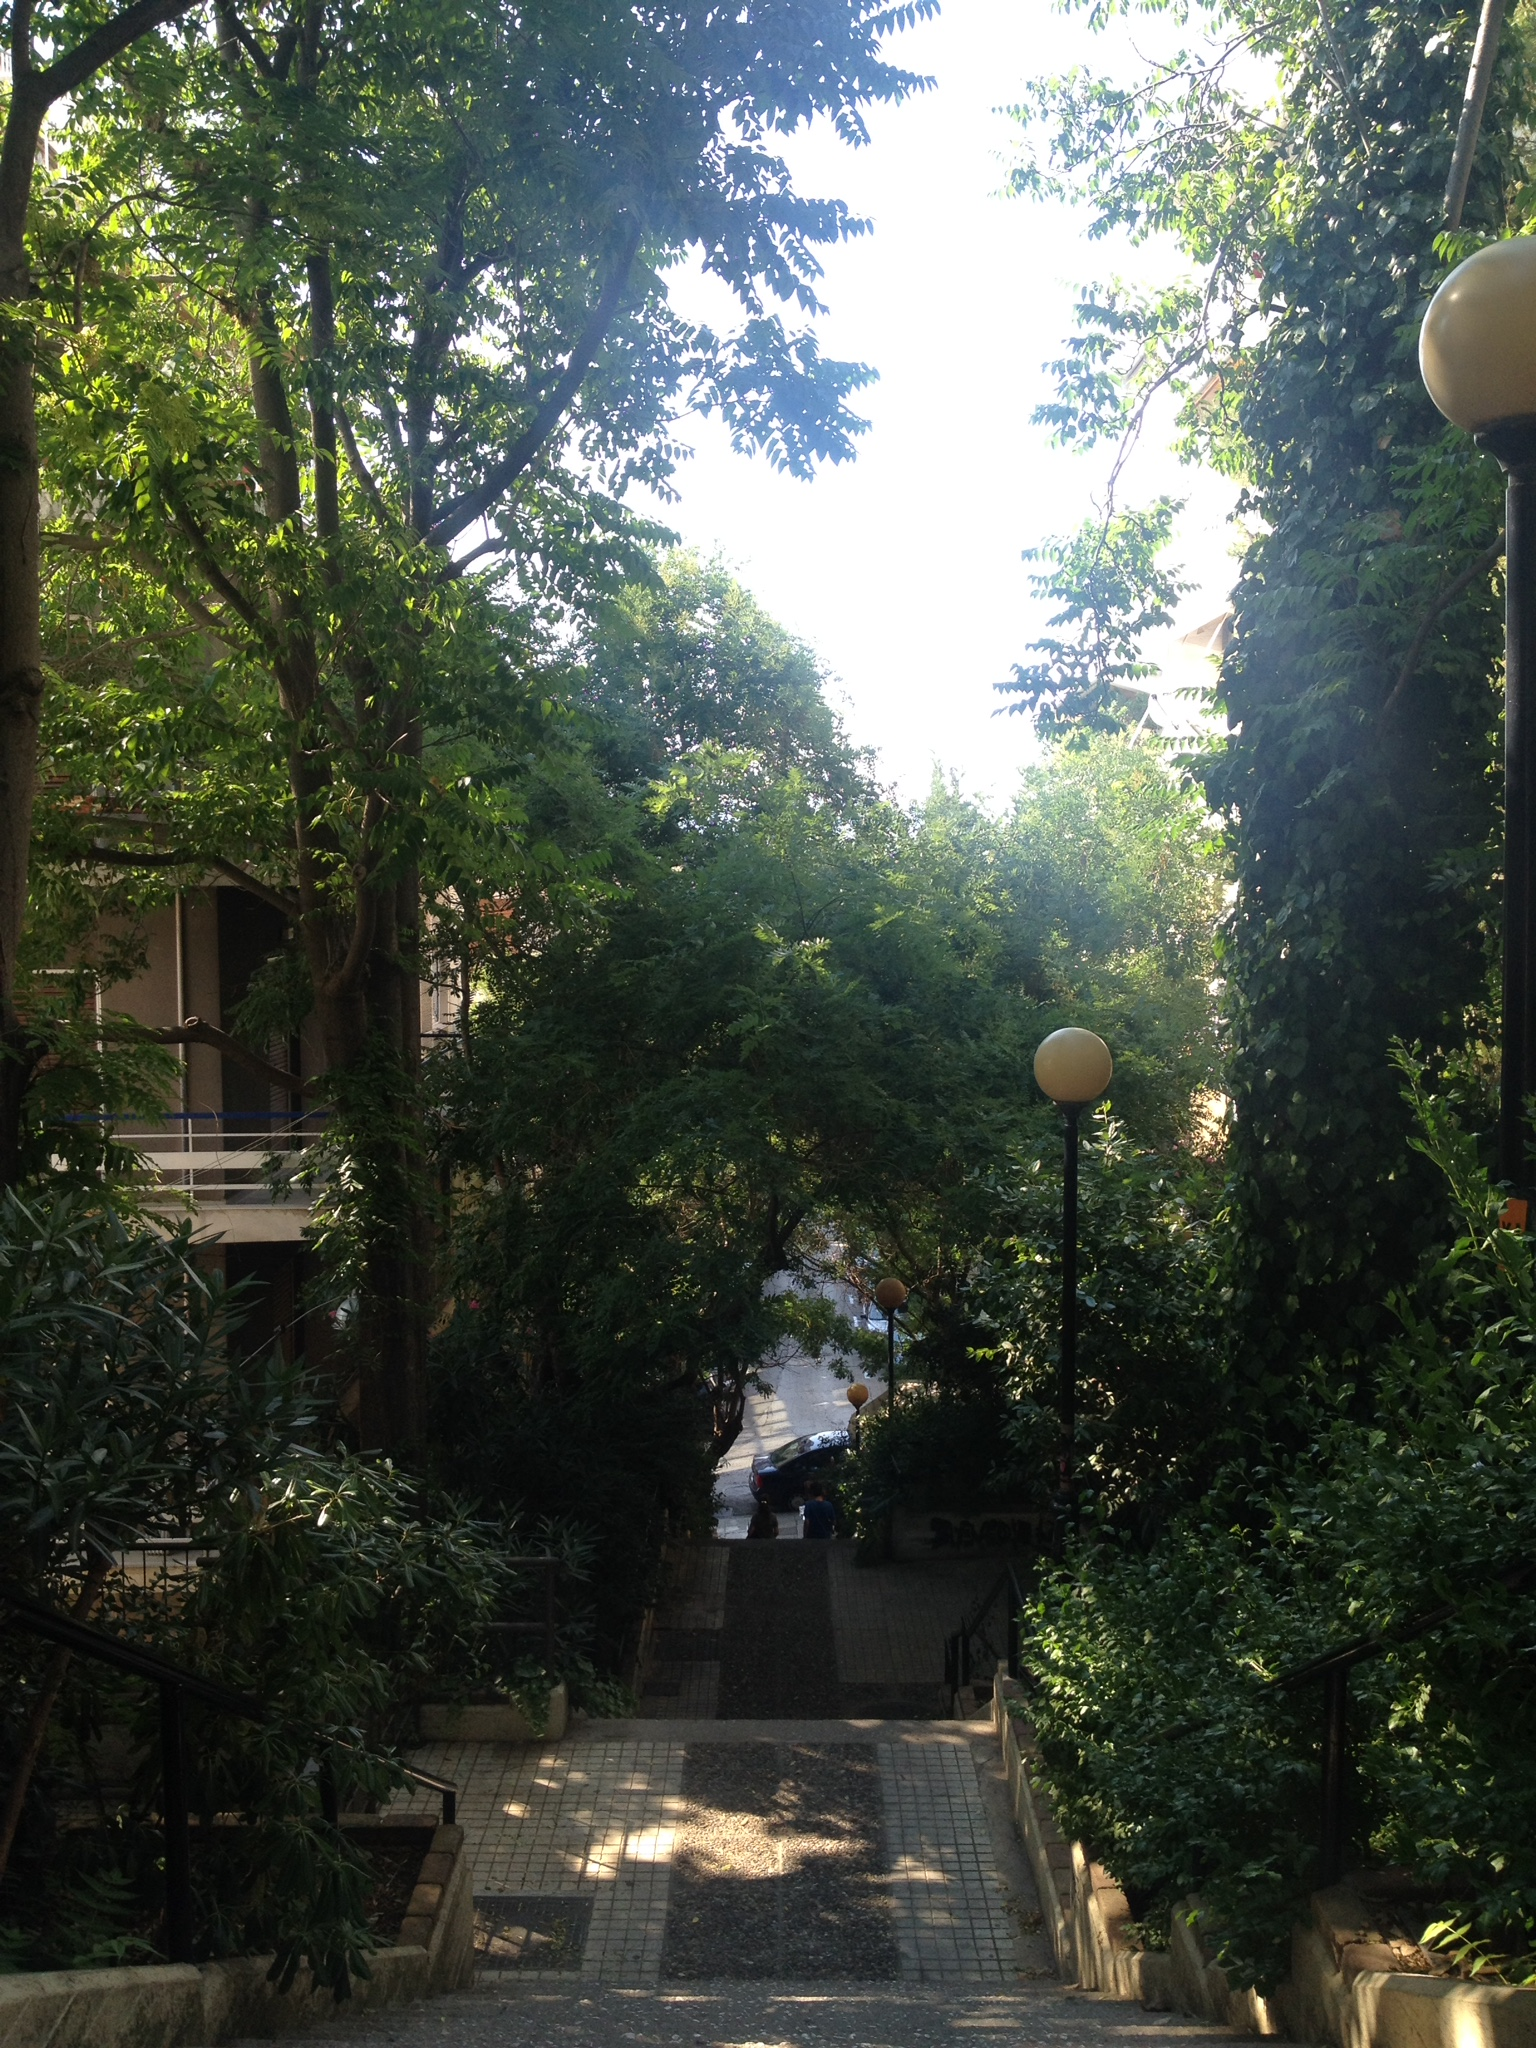 AthensGreeceJuly2015-28